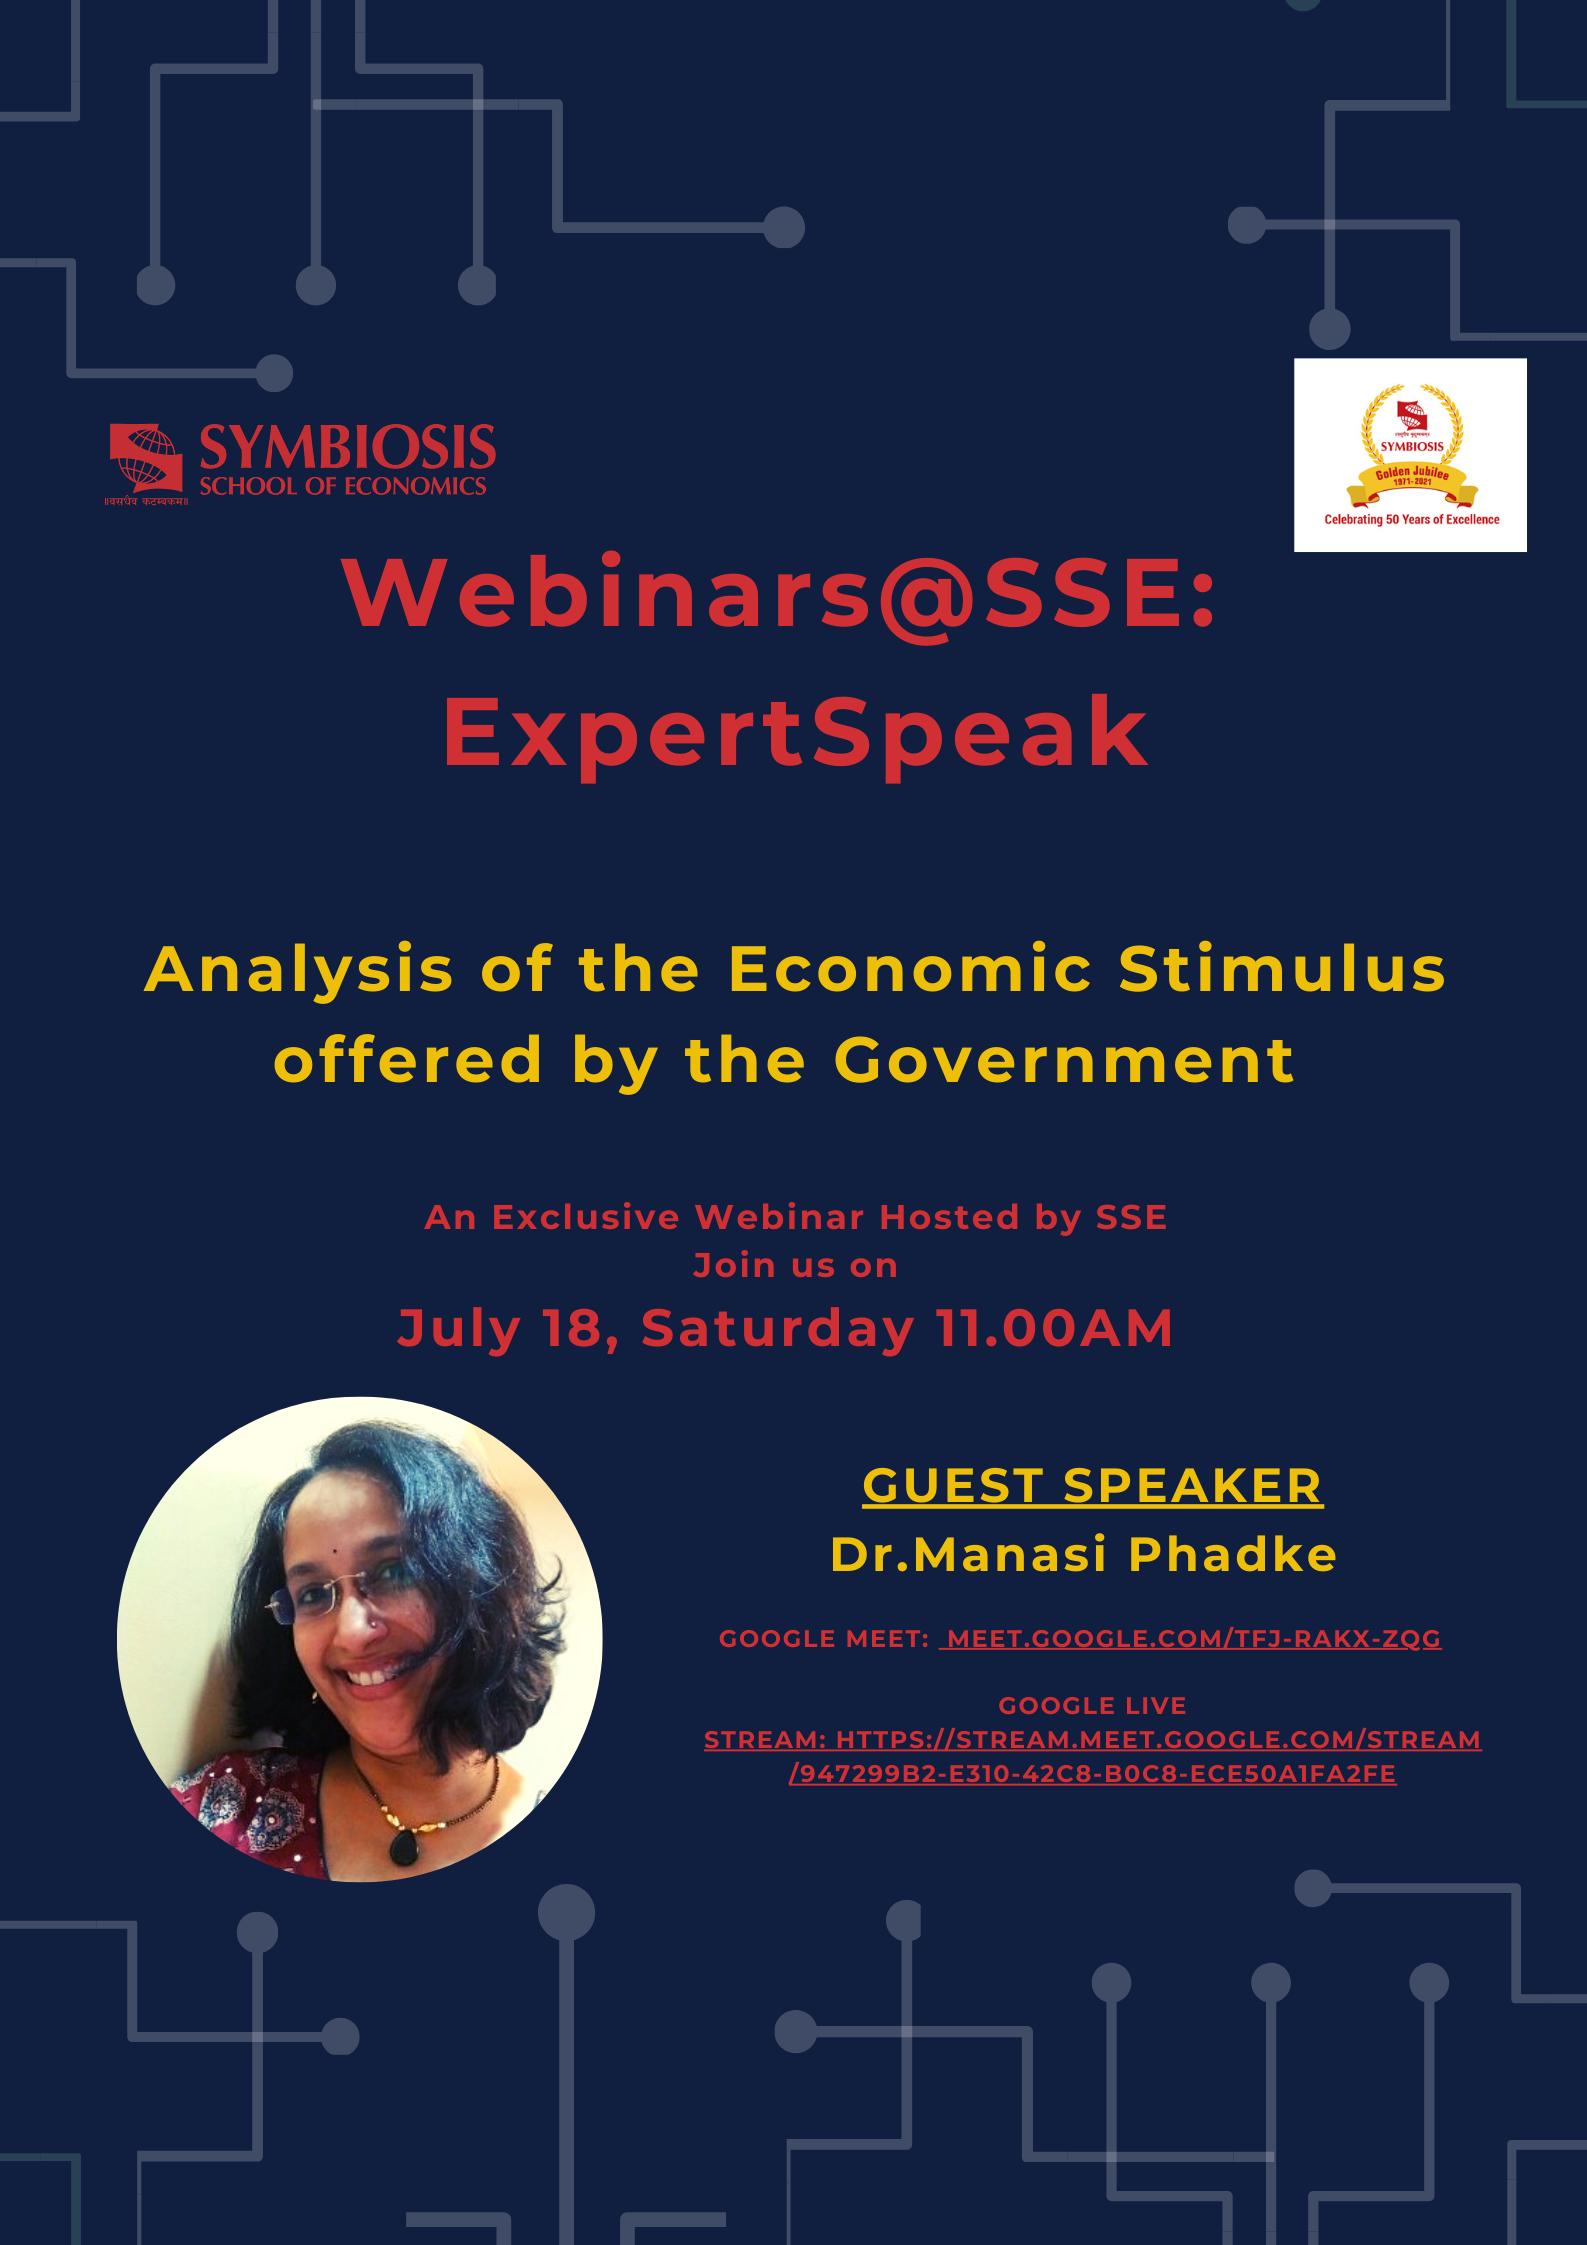 Basic Econometrics And Time Series Data Analysis' FDP